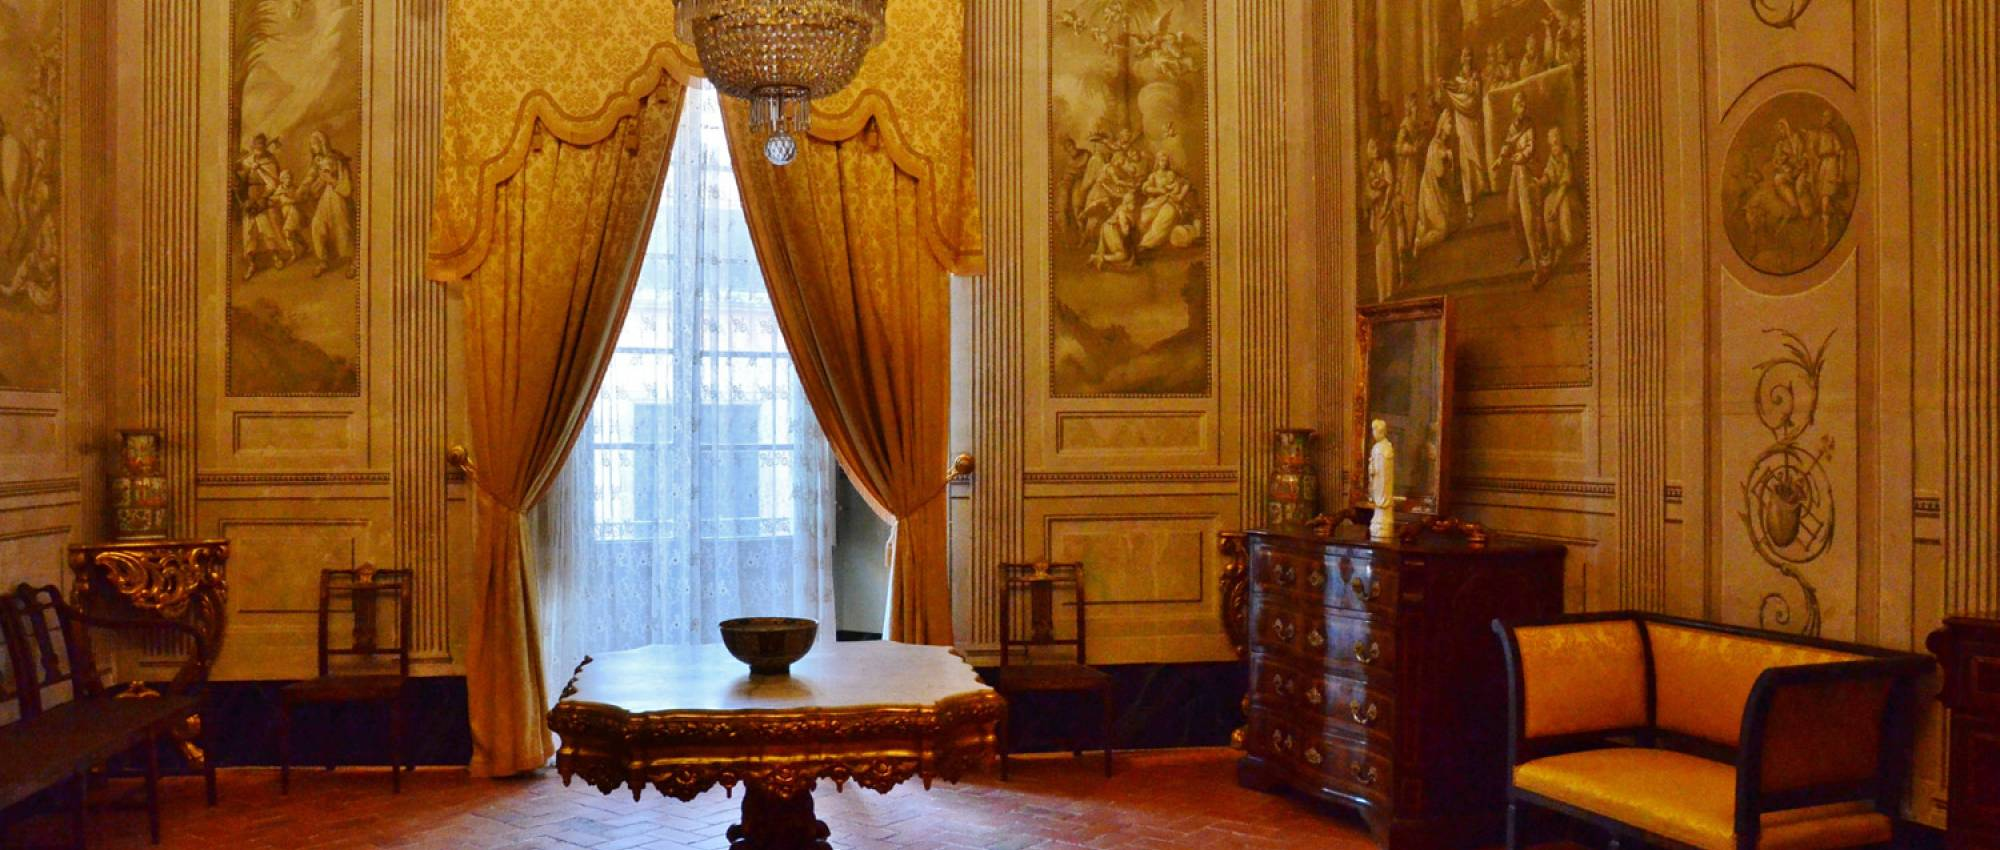 Interior del Museu Romàntic Can Papiol. CC BY-SA 2.0 - Maria Rosa Farre / Wikimedia Commons